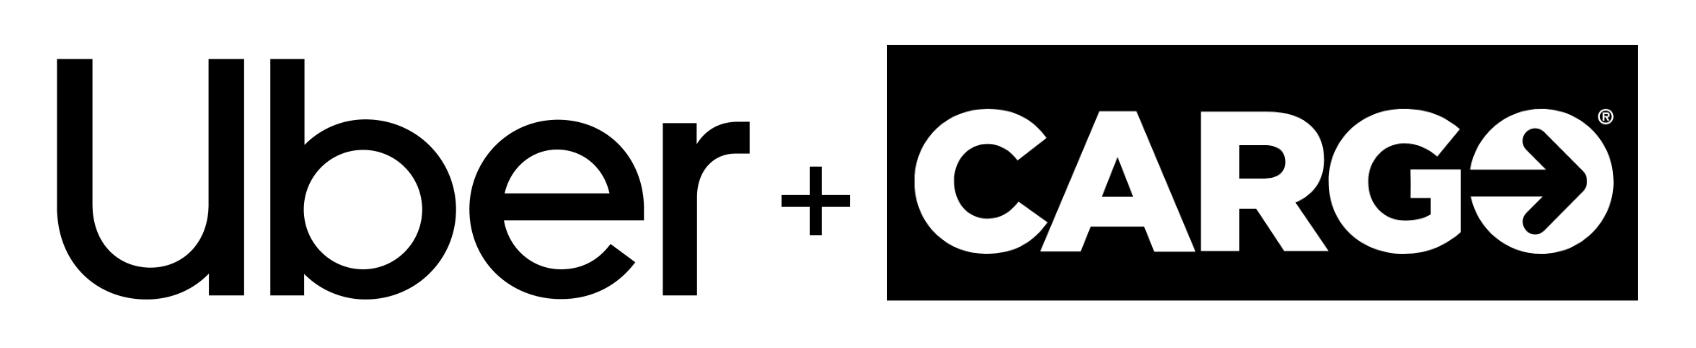 uber_cargo_logo